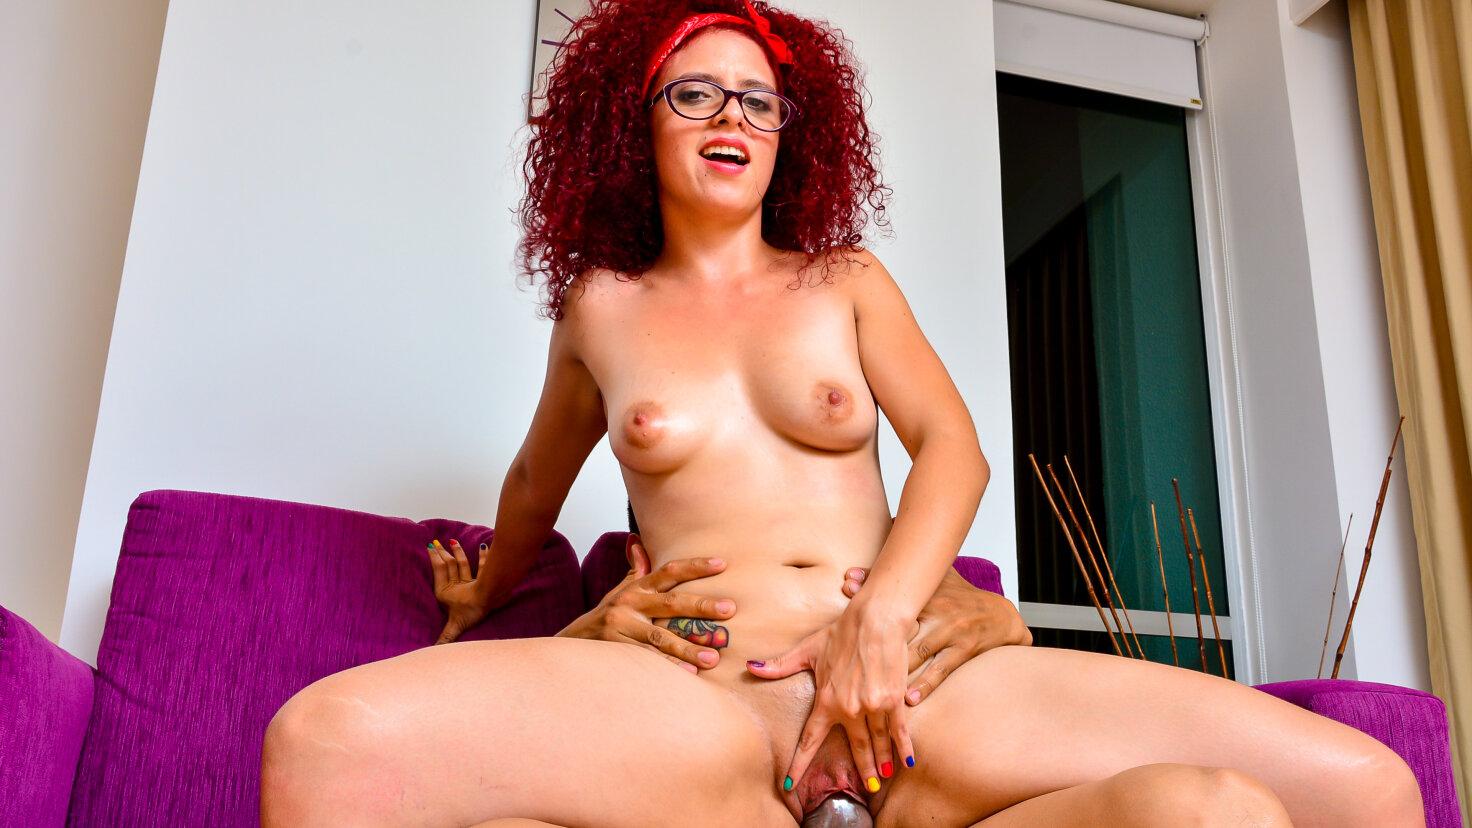 Wild Colombian babe eats cum in steamy hard revenge fuck - Tu Venganza